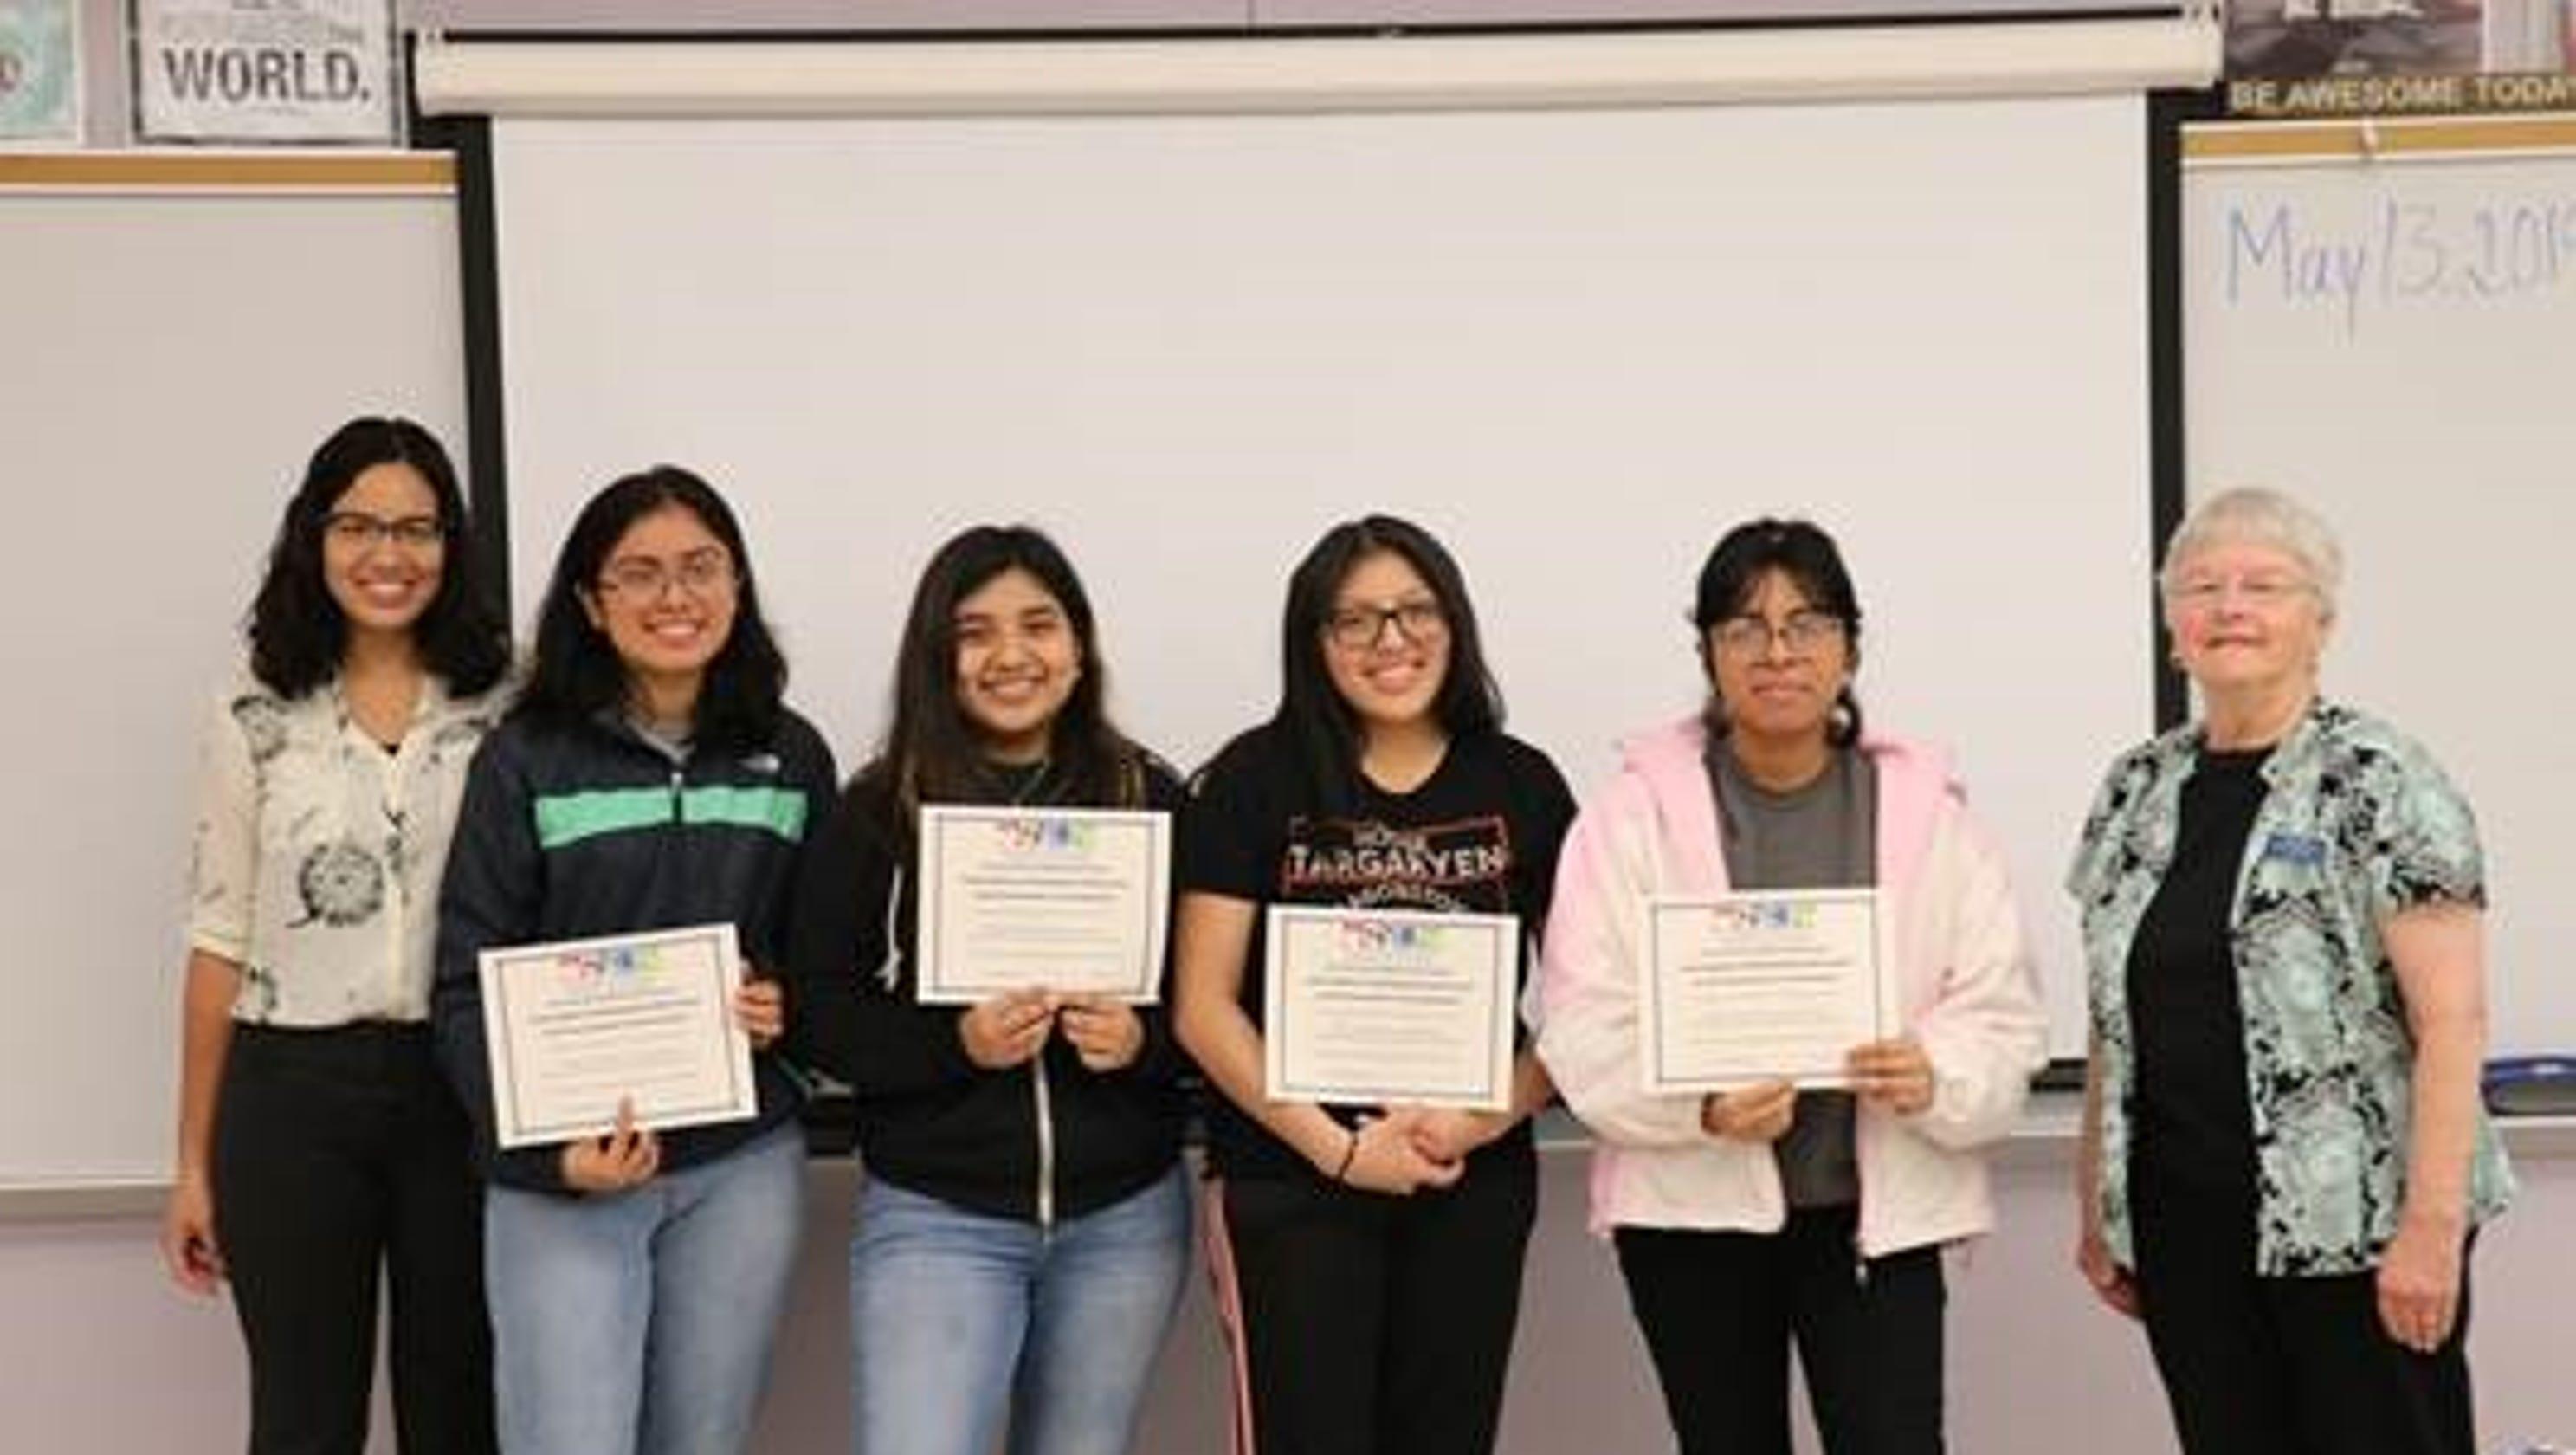 NJ students: League of Historical Societies presents history